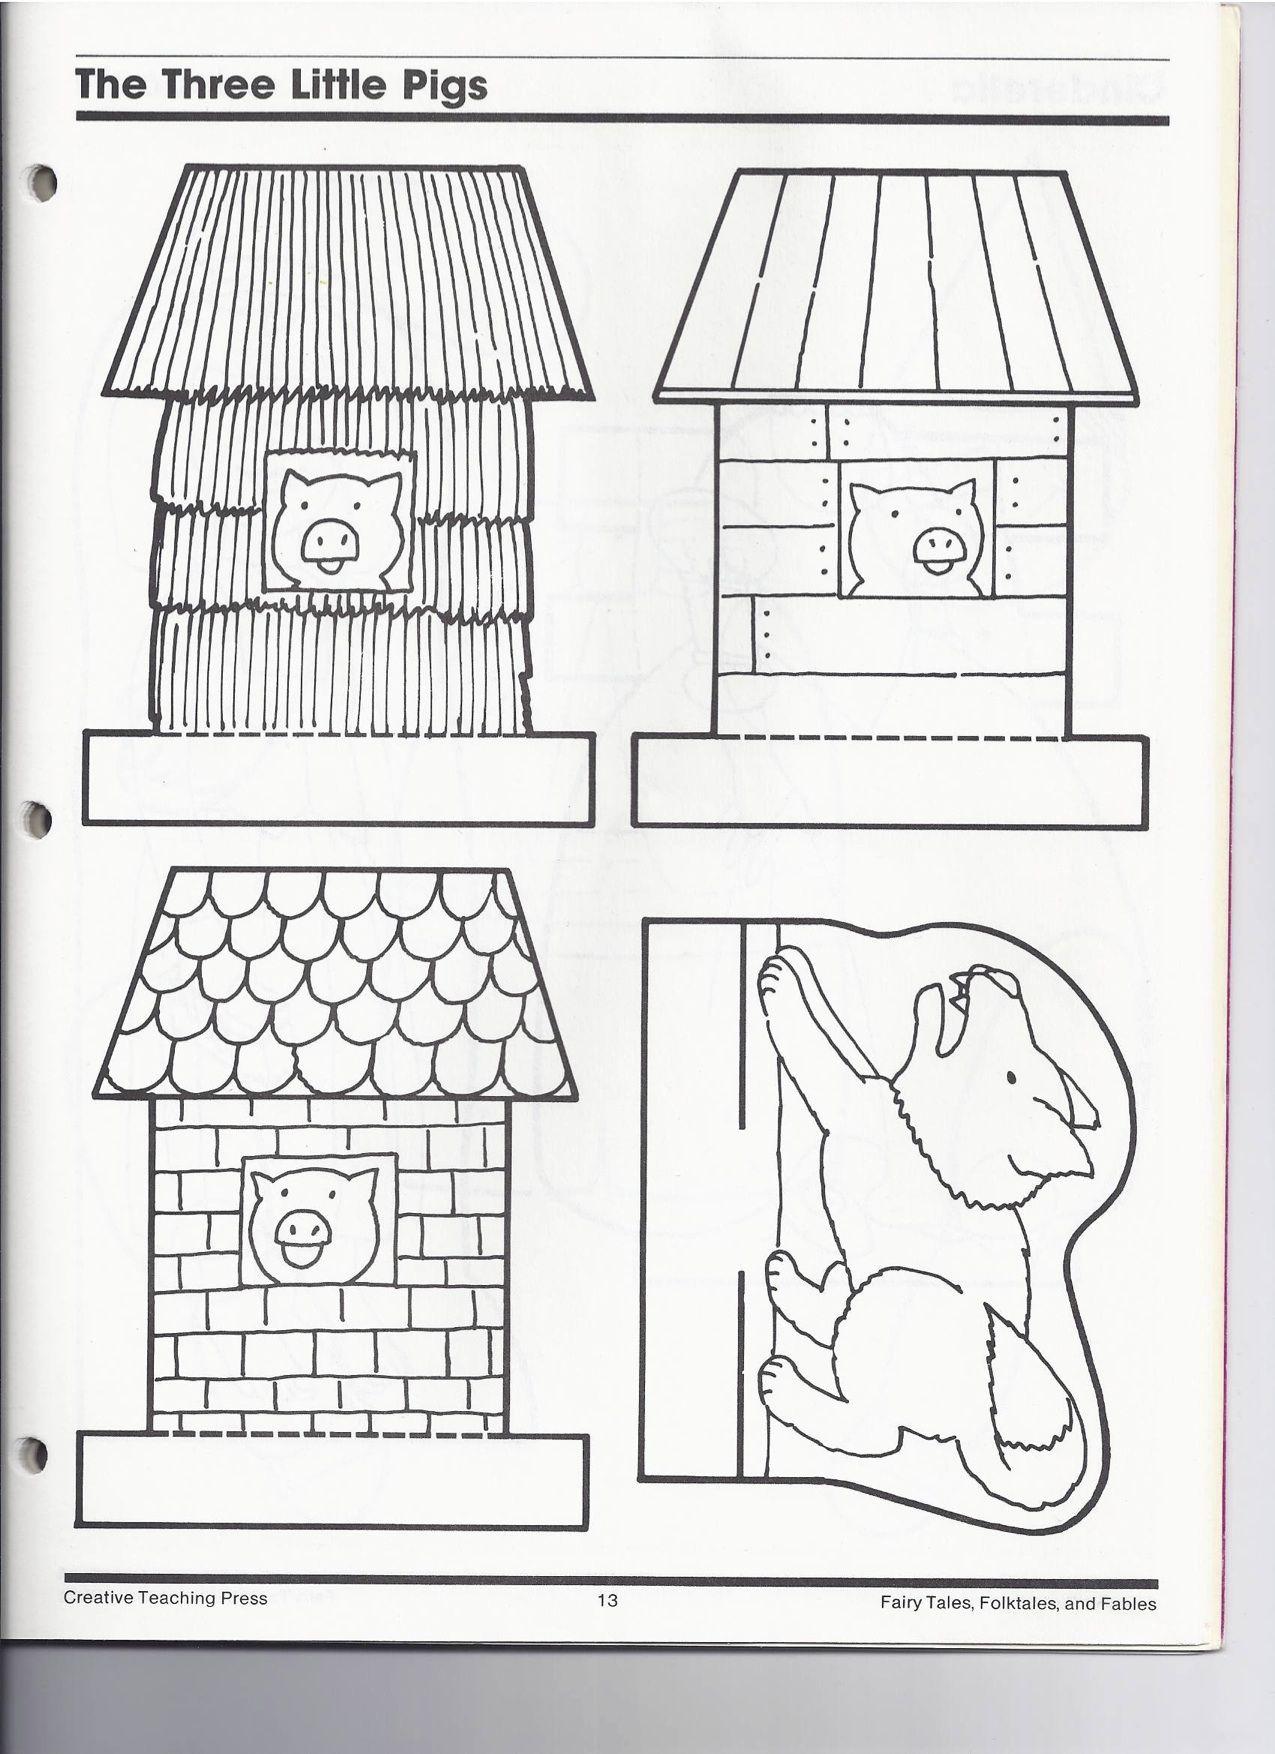 The Three Little Pigs Little Pigs Three Little Pigs Three Little Pigs Houses [ 1754 x 1275 Pixel ]